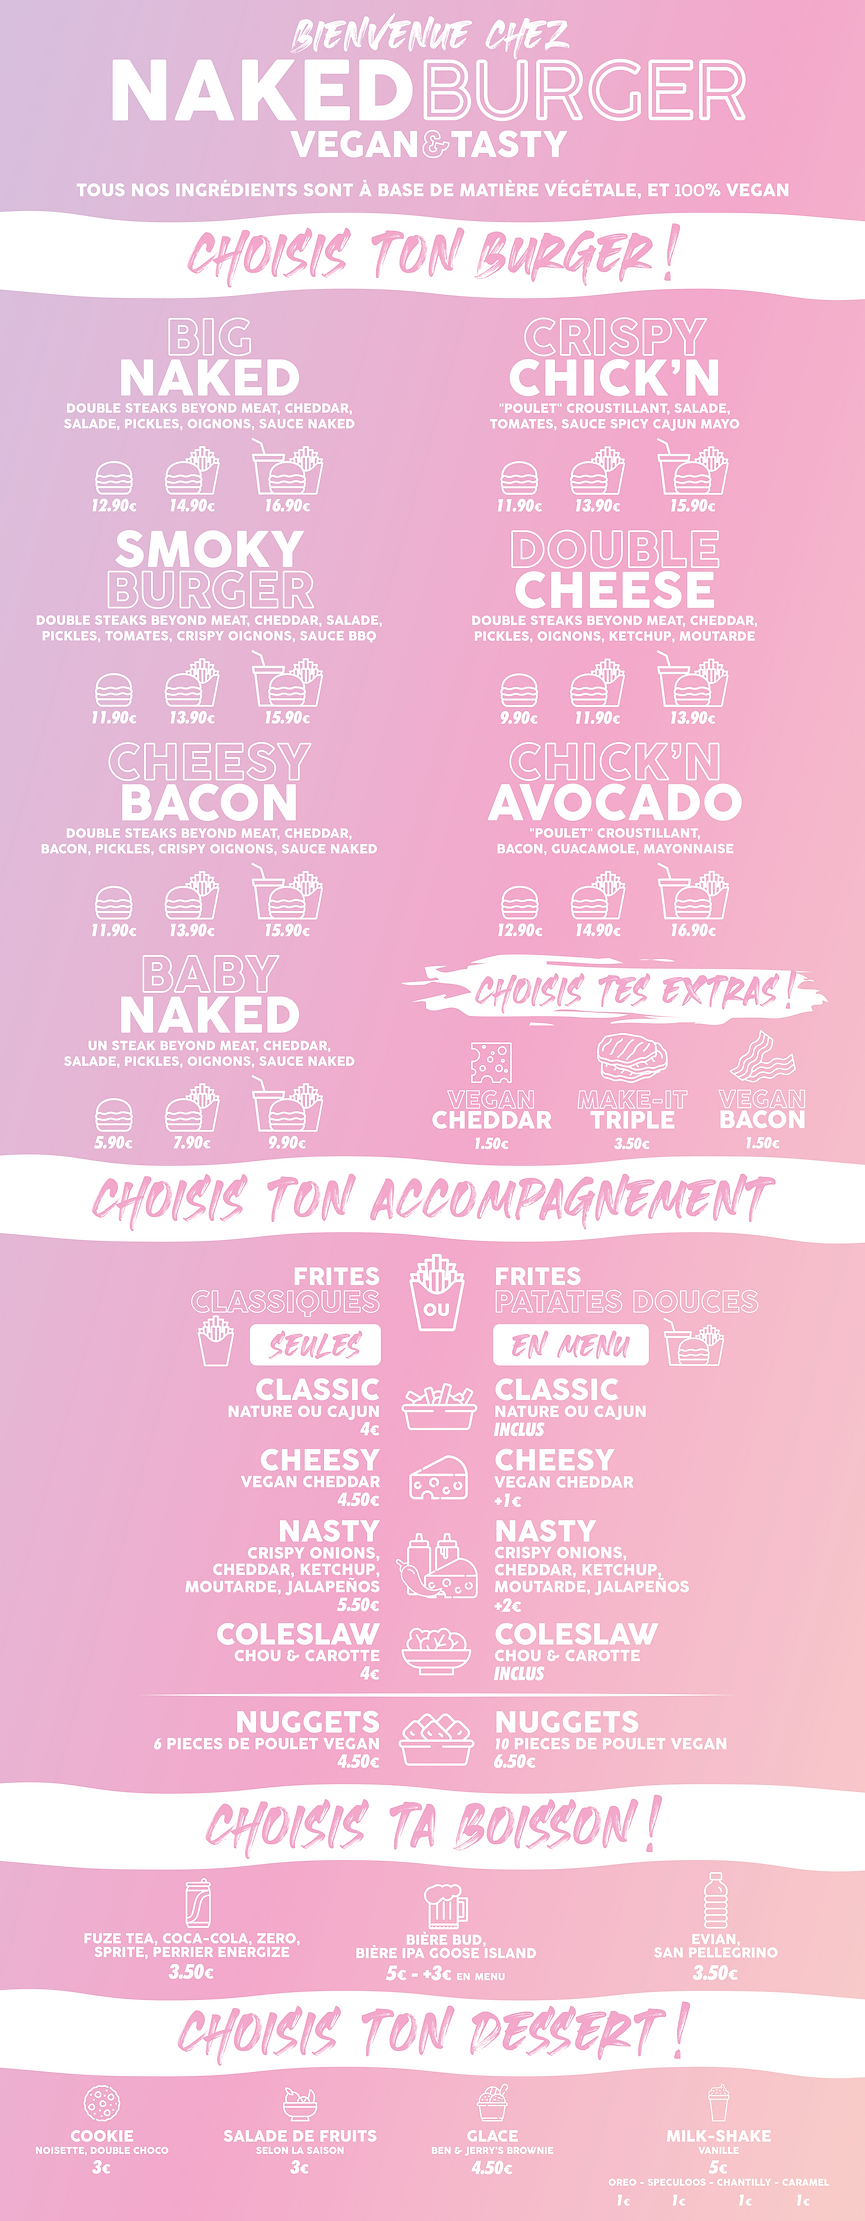 menu Naked Burger